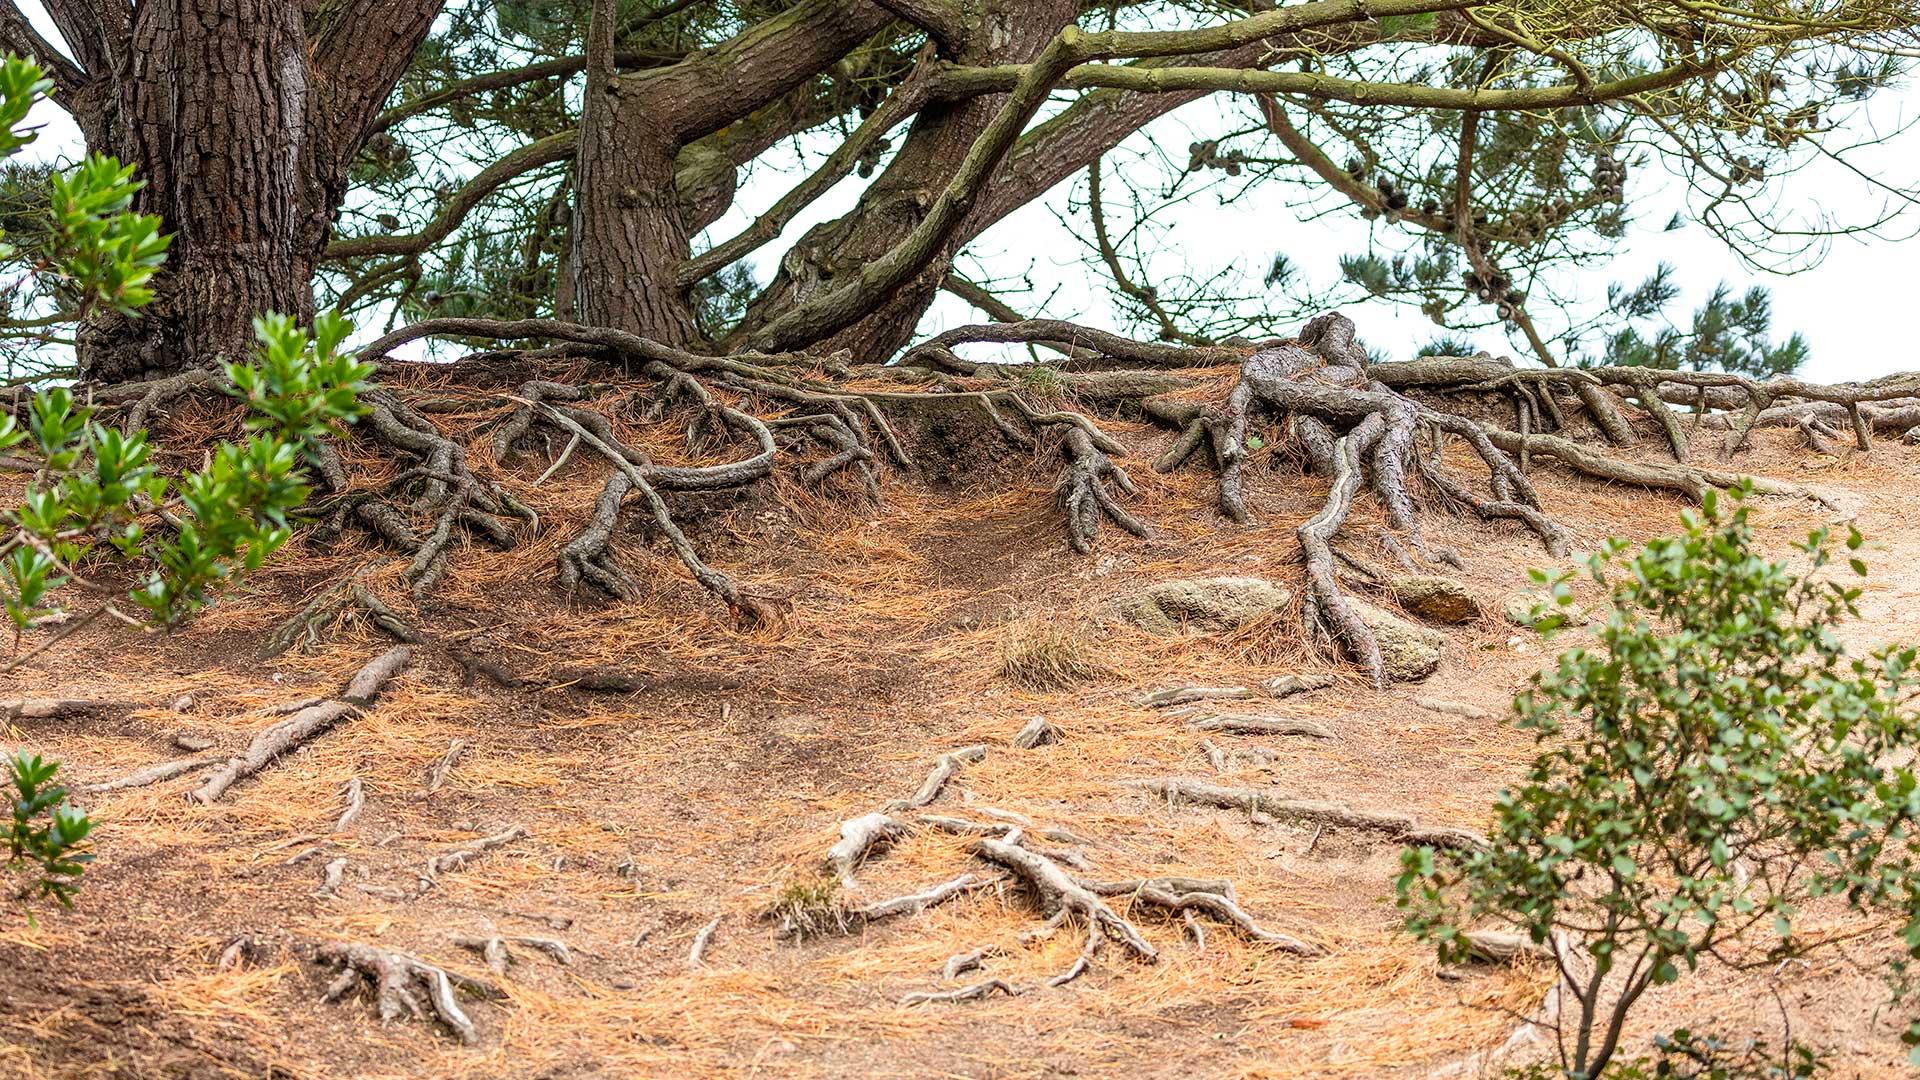 Landschaftsfotografie: Côte de Granit Rose – Wurzelwerk: Bretonische Bodenhaftung | Foto: Dieter Eikenberg, imprints